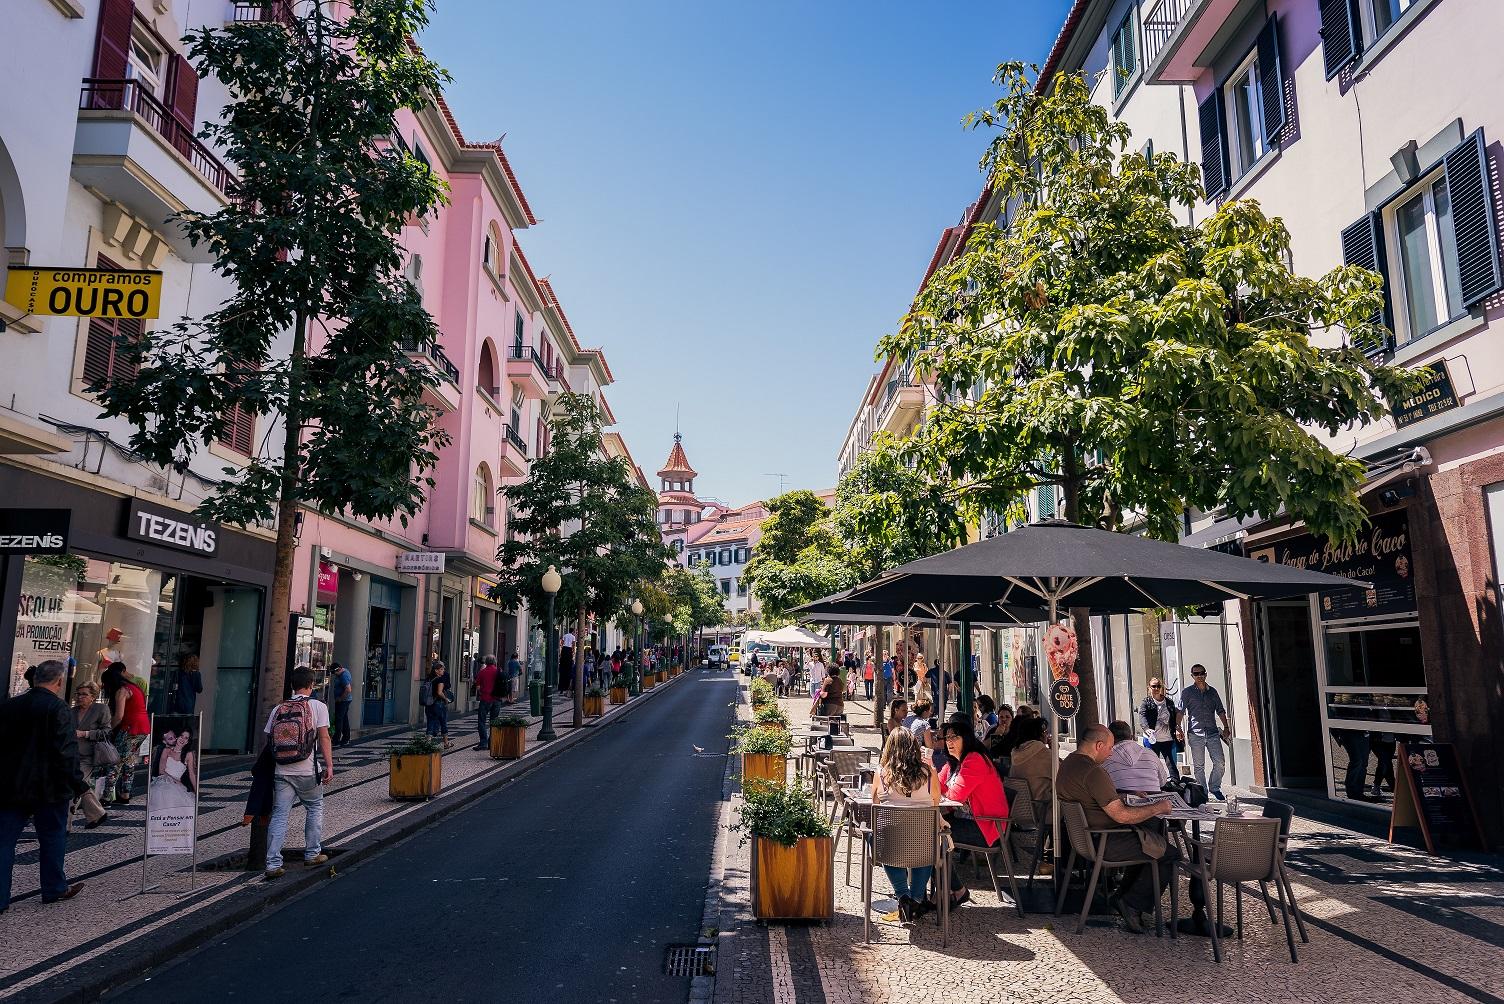 Francisco Correia and Visit Madeira 6 2